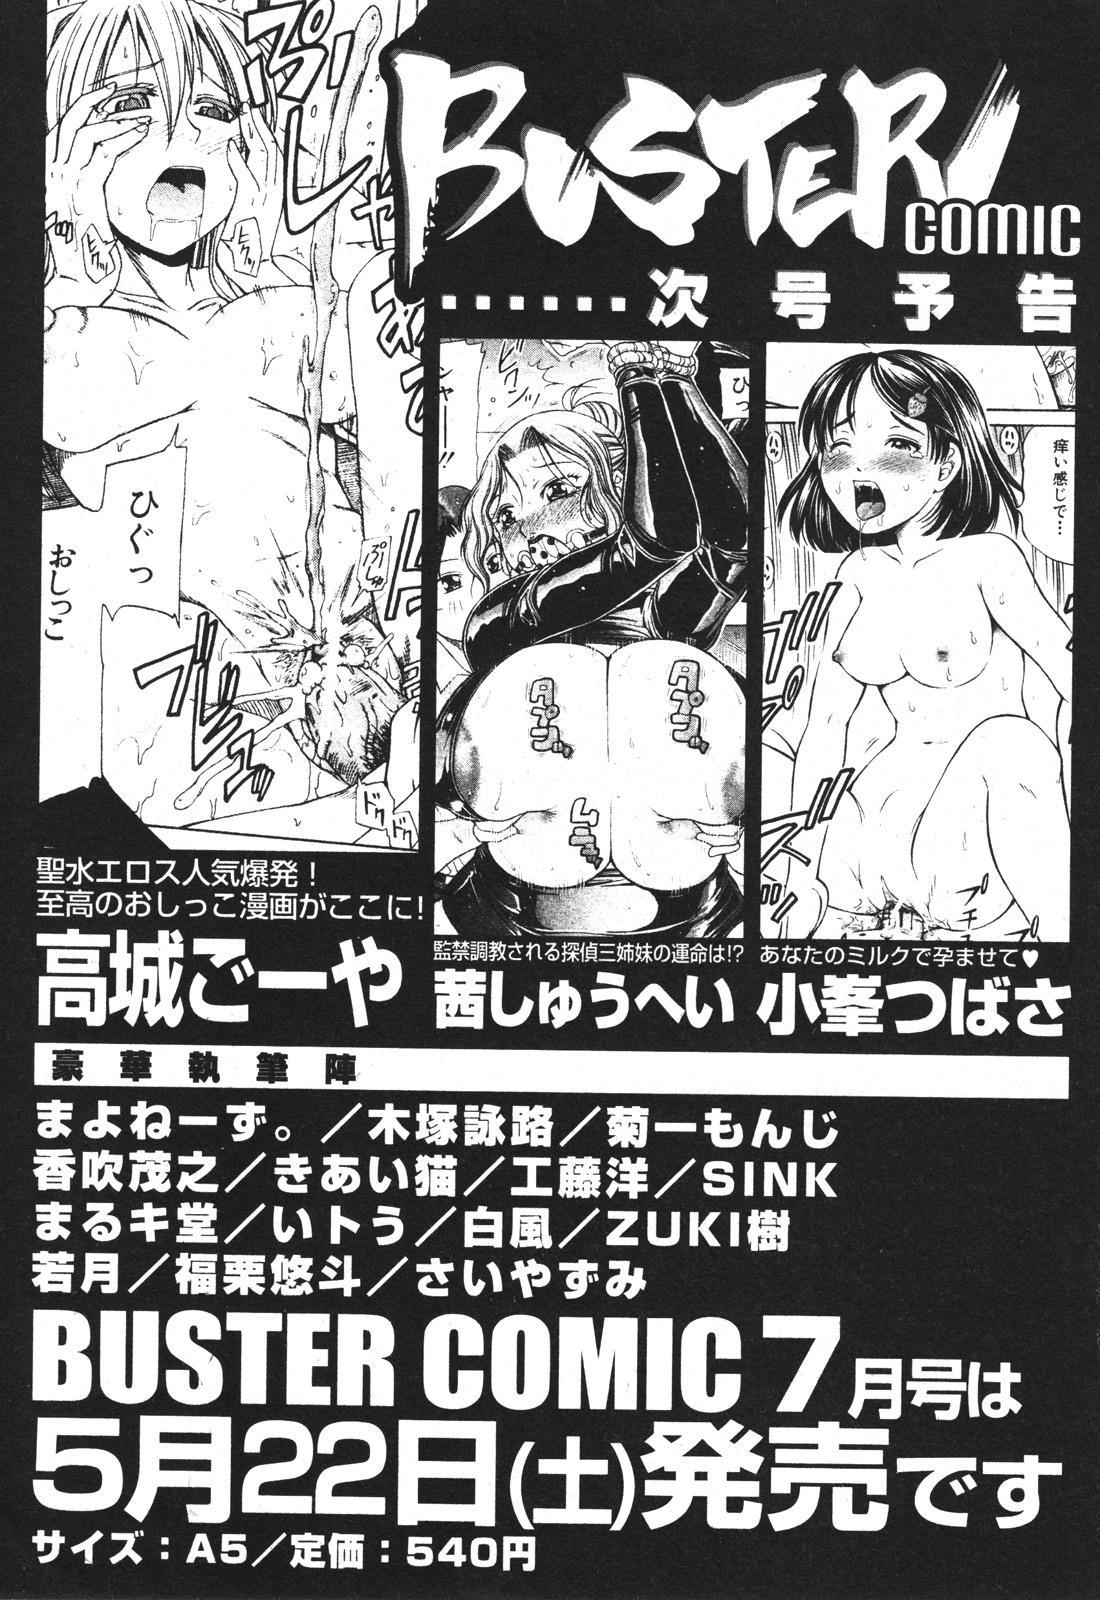 BUSTER COMIC 2010-05 Vol.07 485